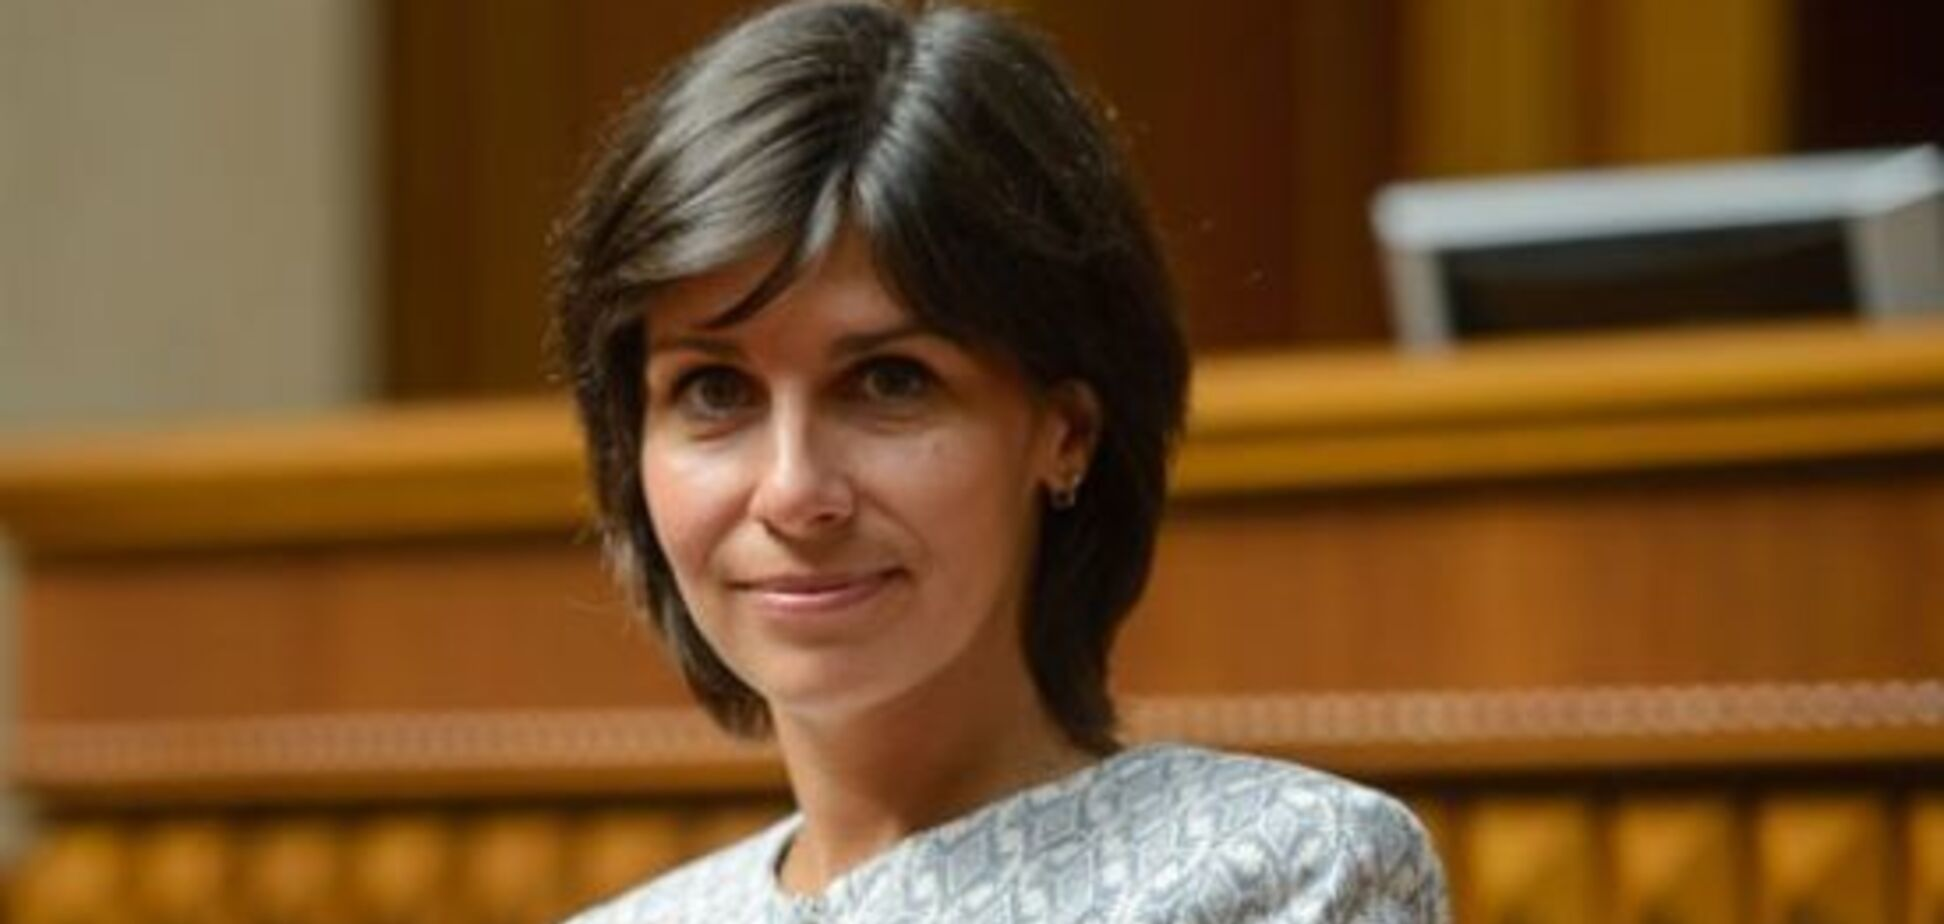 Законопроект 9055 блокируют из-за децентрализации адвокатуры – Пташник